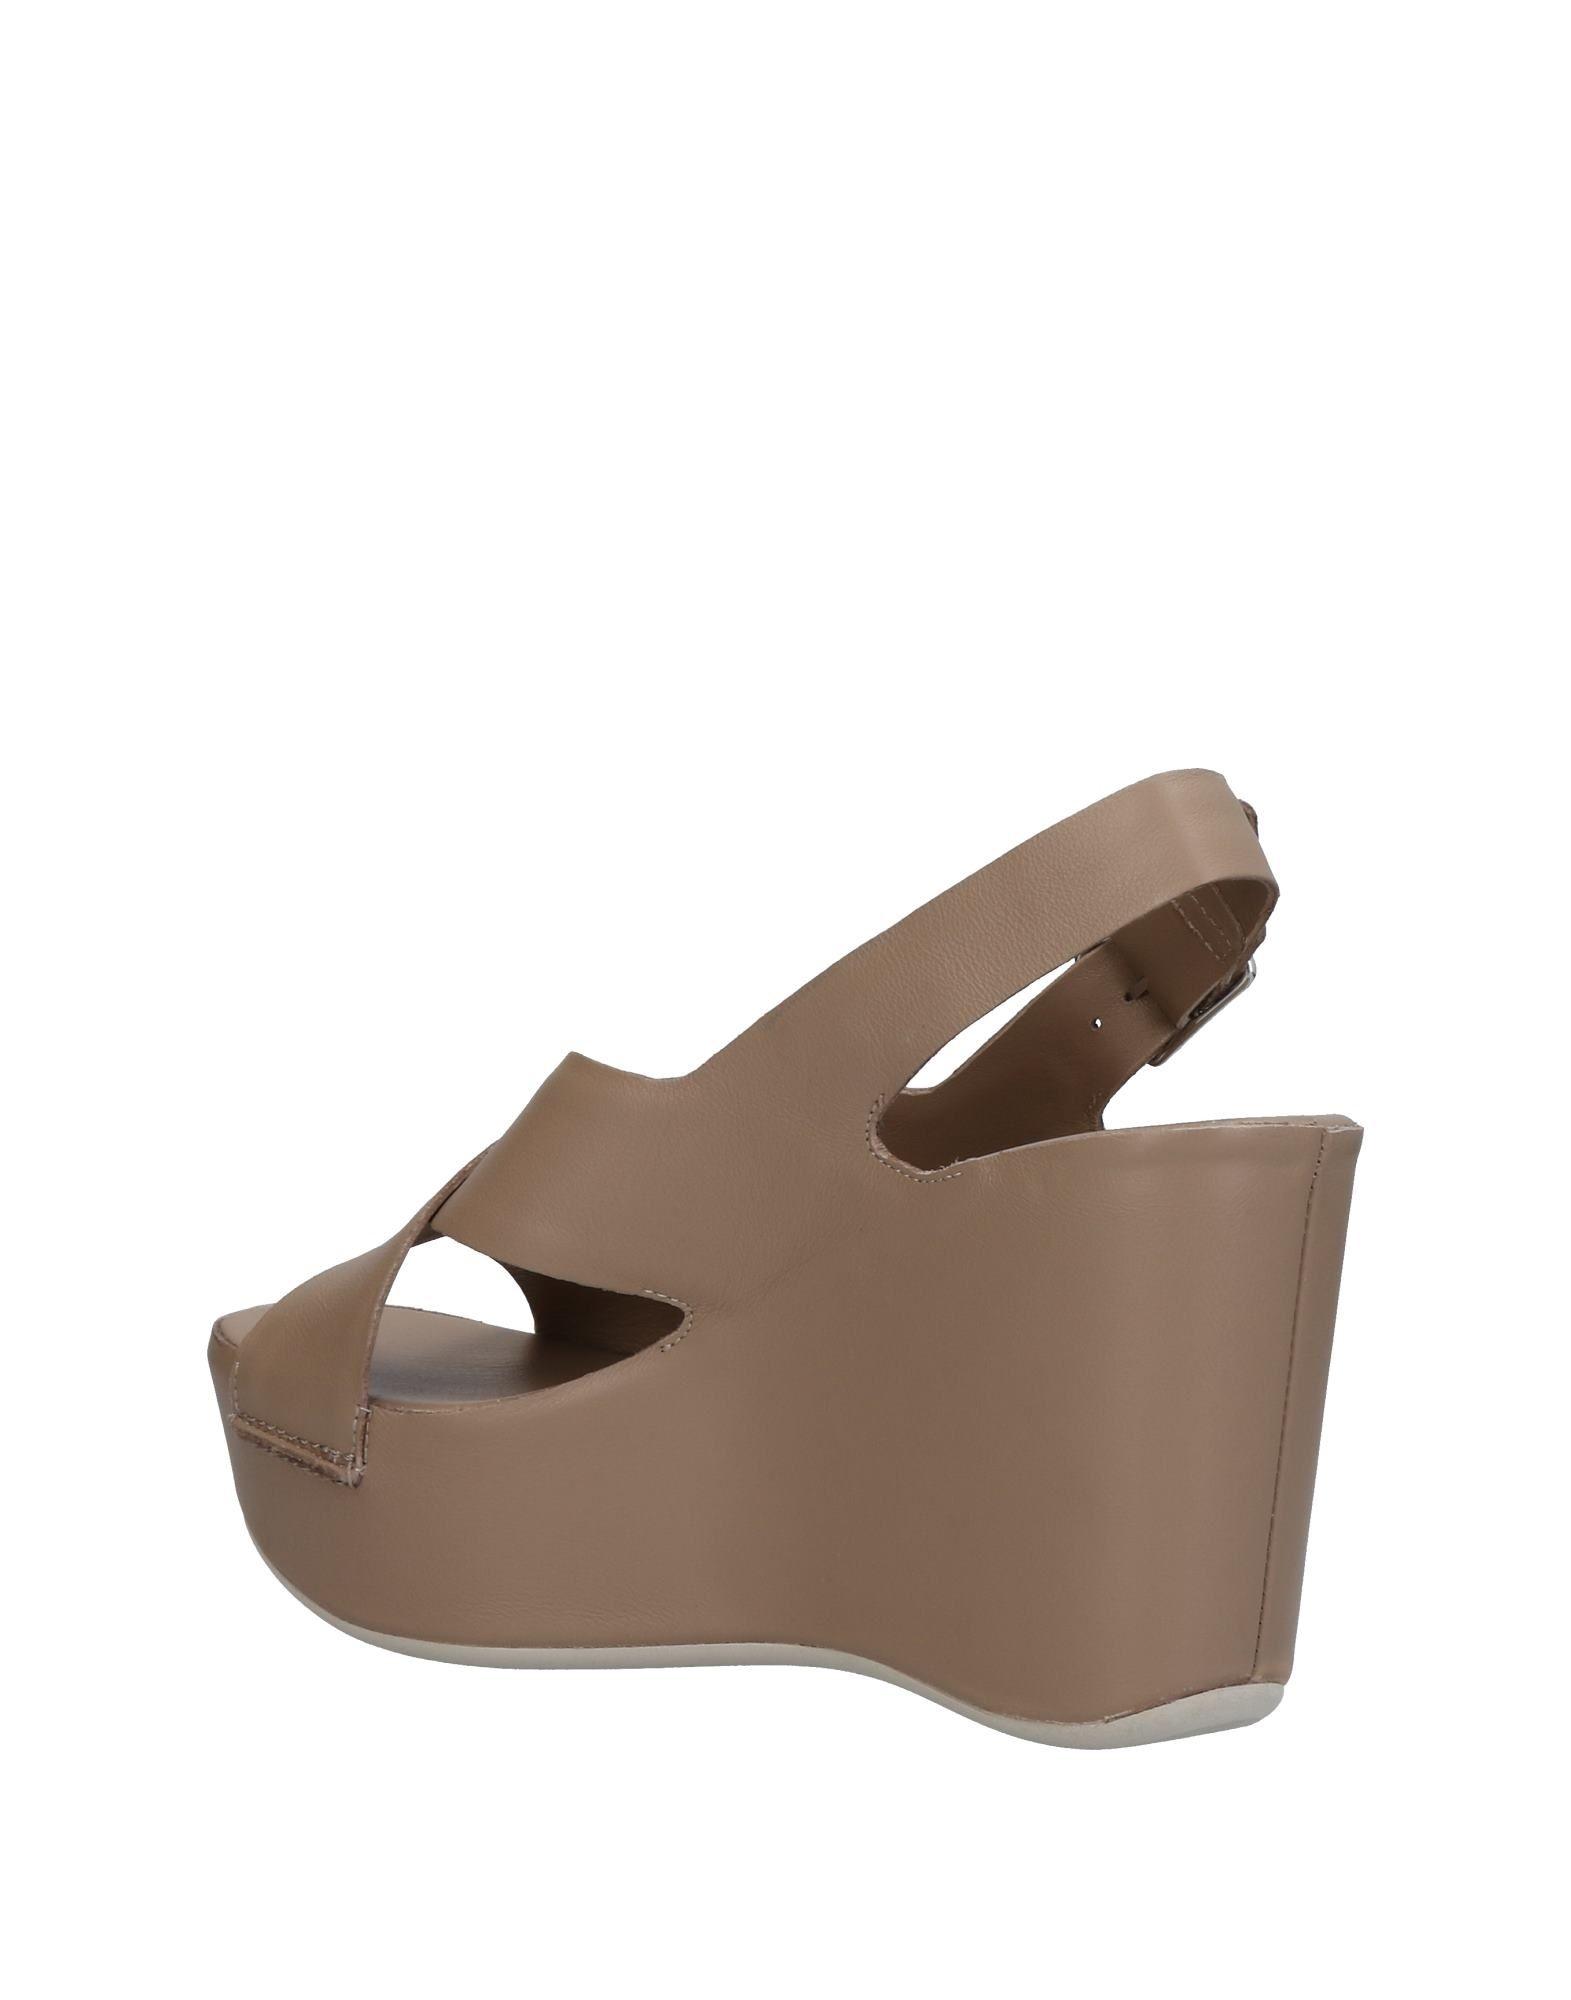 Roberto Del Carlo Schuhe Sandalen Damen  11425290OR Neue Schuhe Carlo 798b00